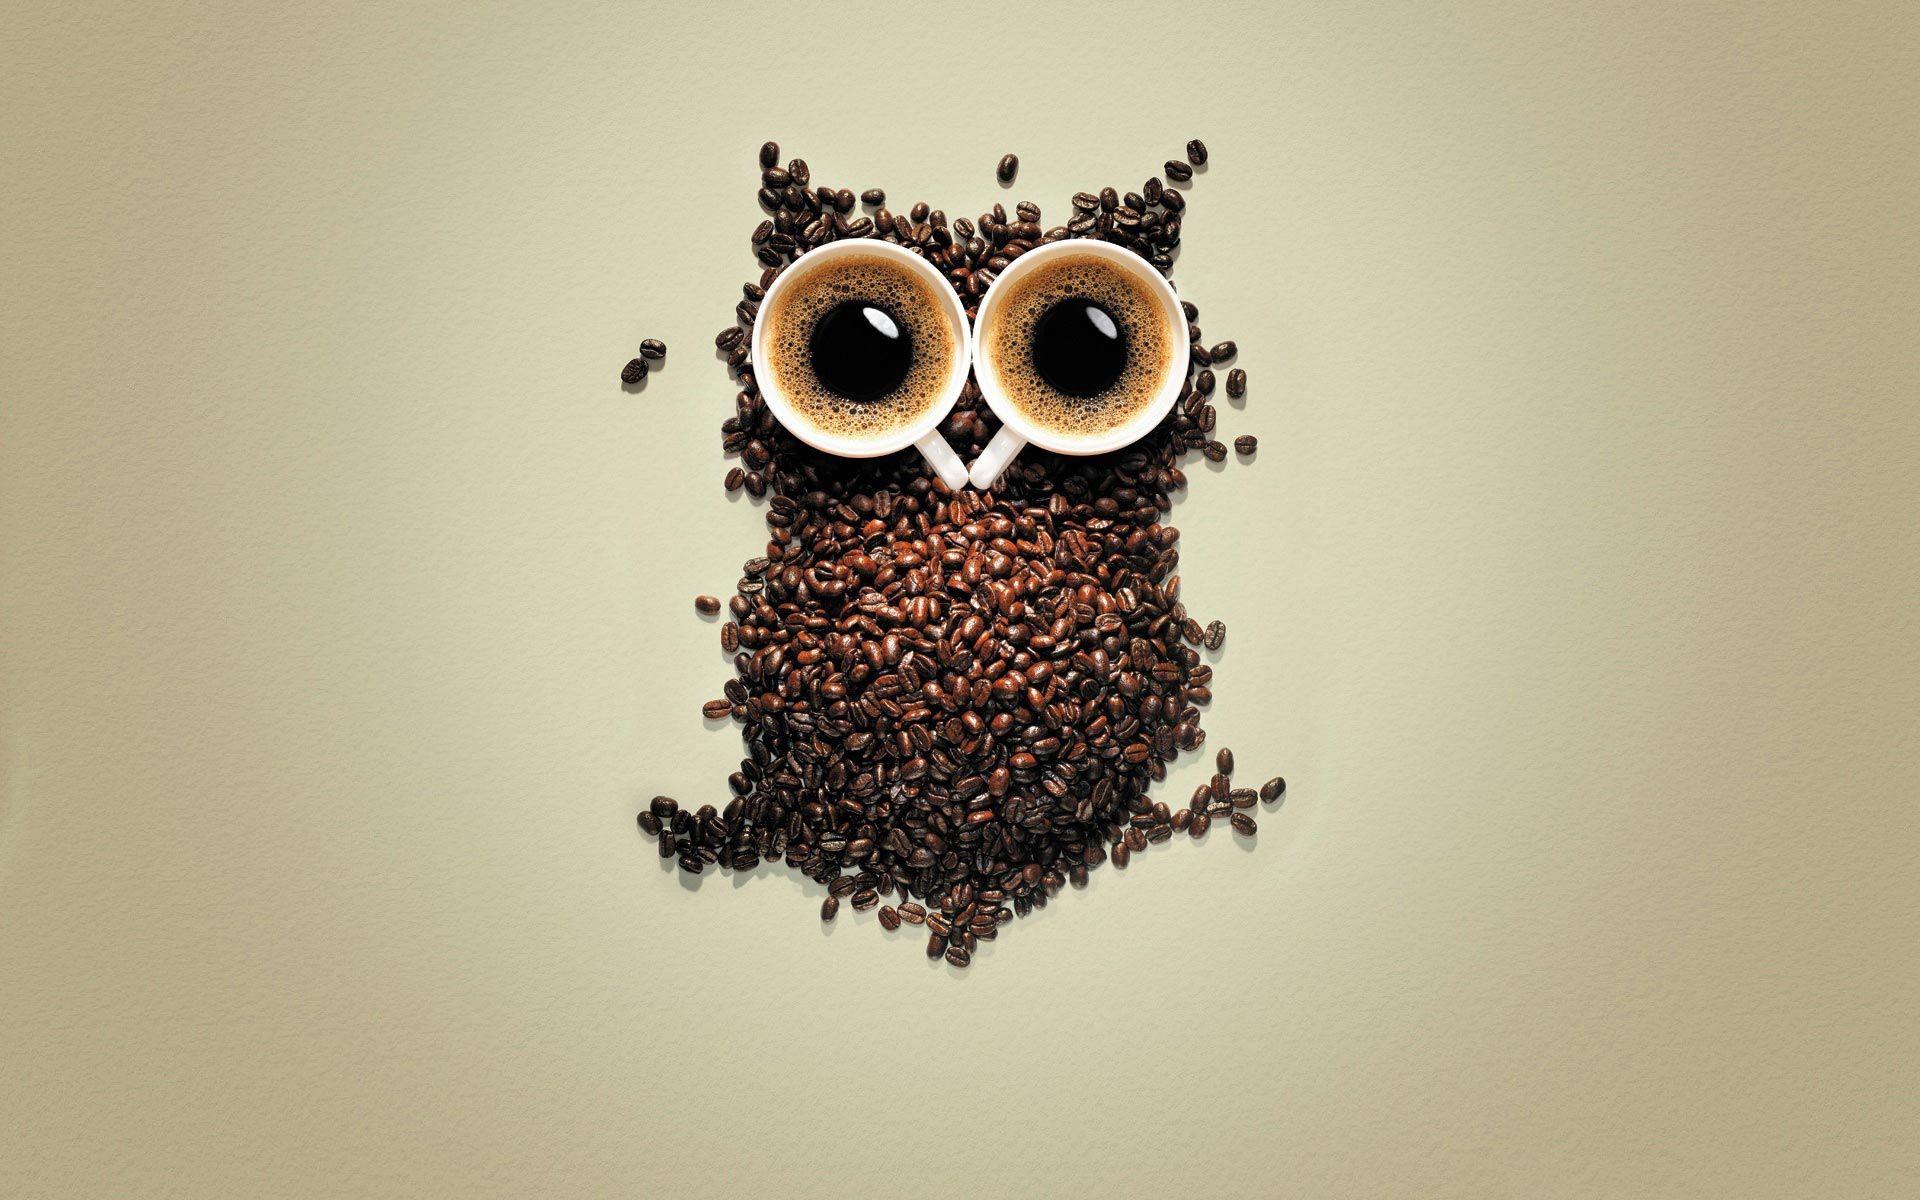 Coffee Funny Owl Artistic Coffee Beans 1920x1200